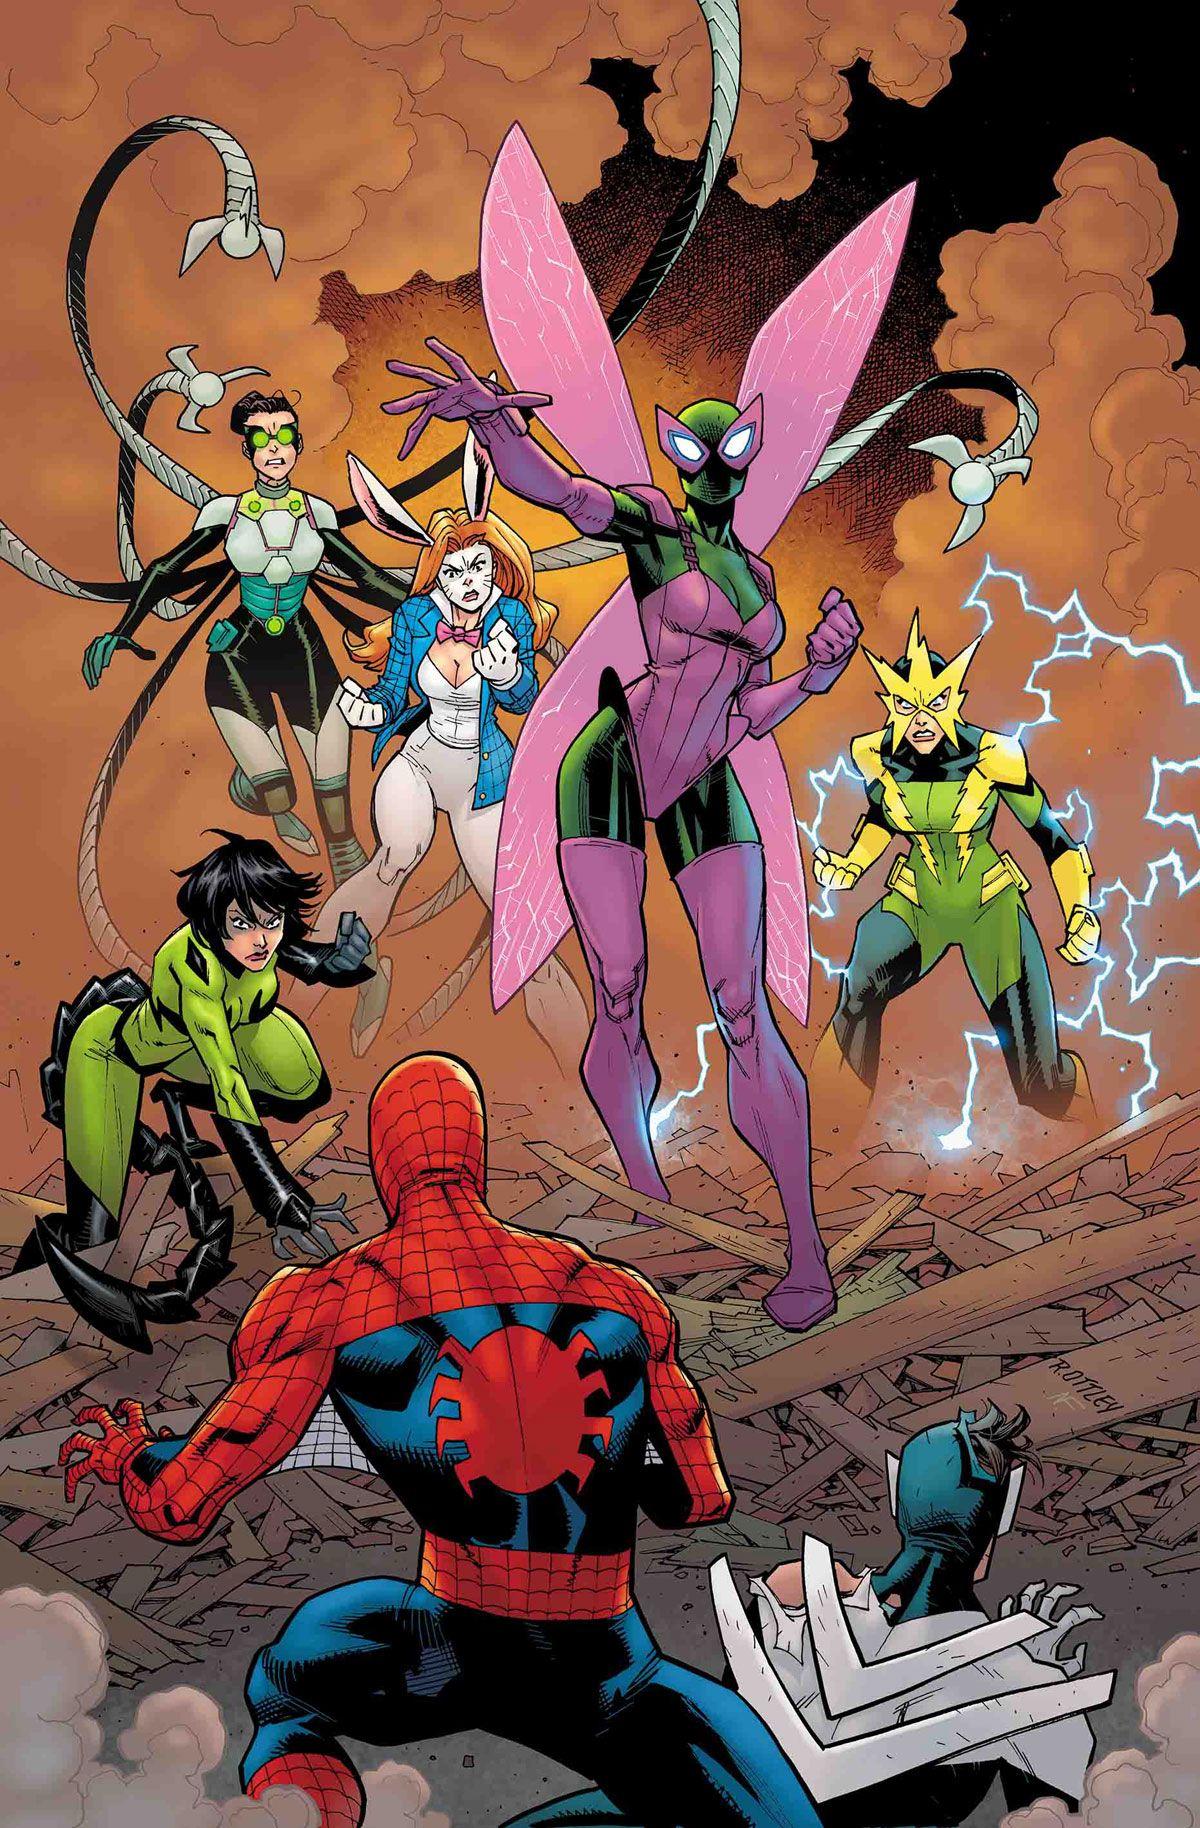 Amazing Spider-man #22 Main Cover STOCK PHOTO Marvel 2019